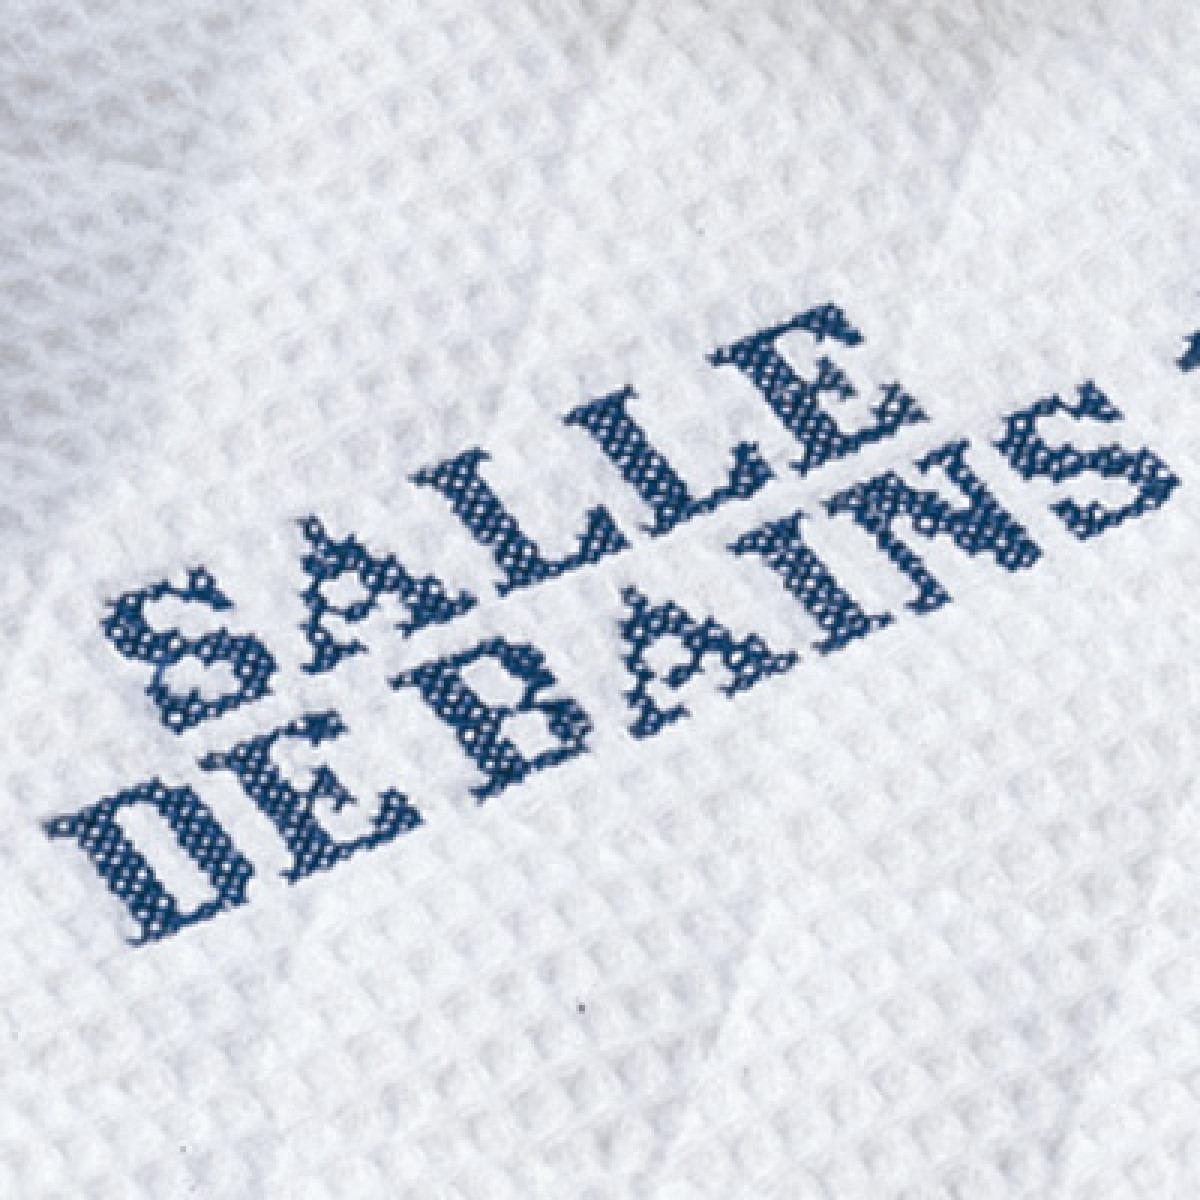 Salle De Bains bath mat, guest towel and slippers